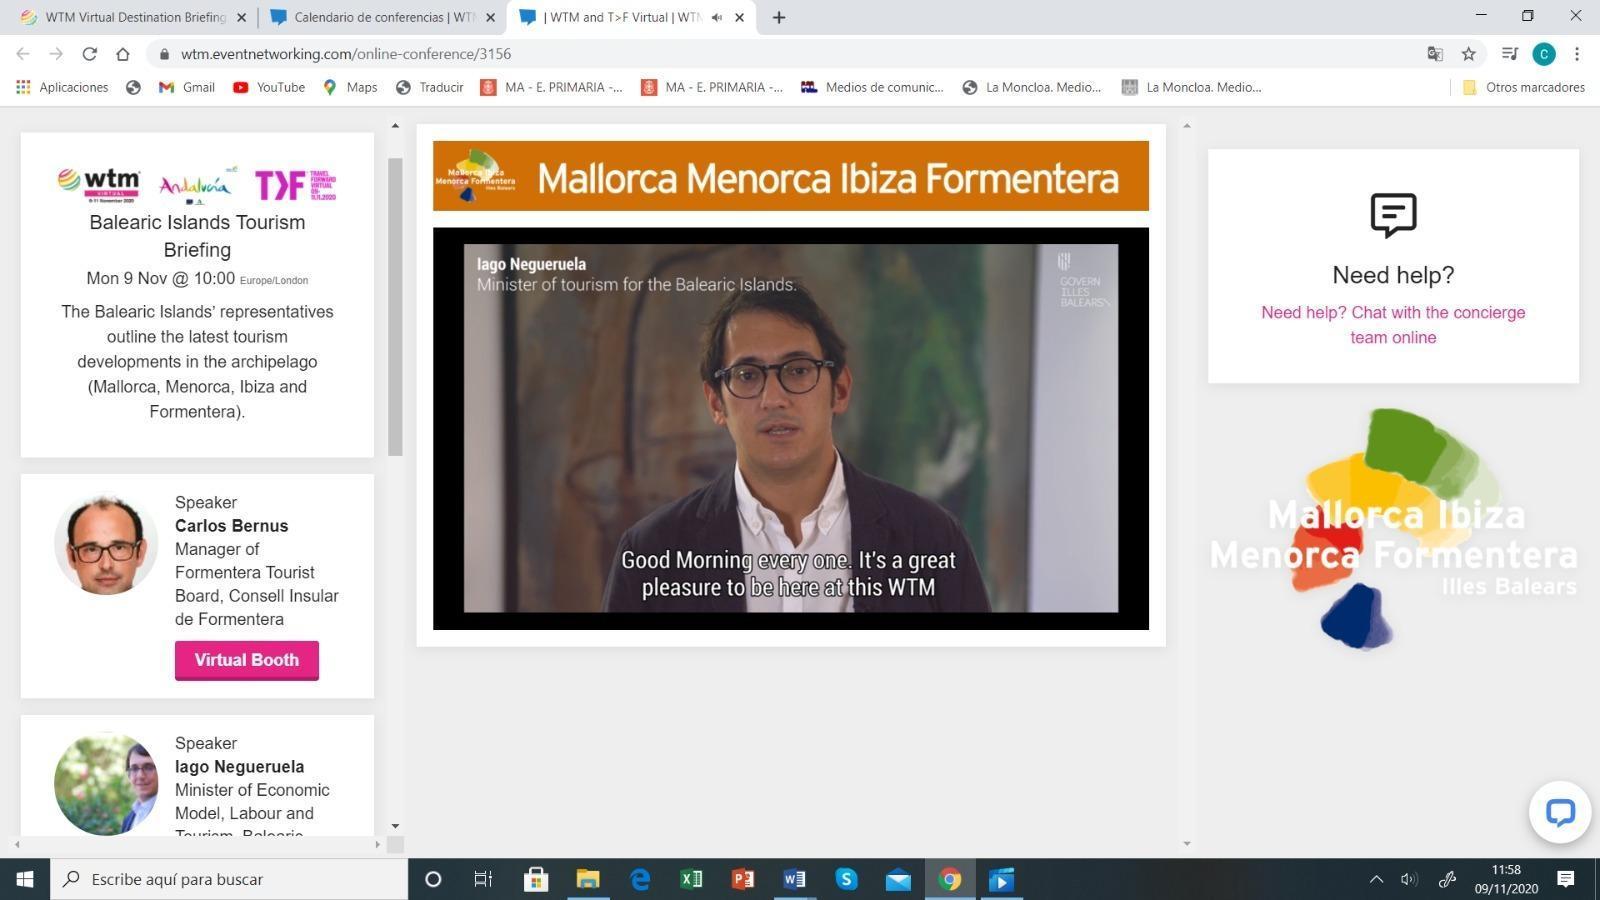 El conseller Iago Negueruela defensa que les Balears estan preparades per a la temporada turística del 2021